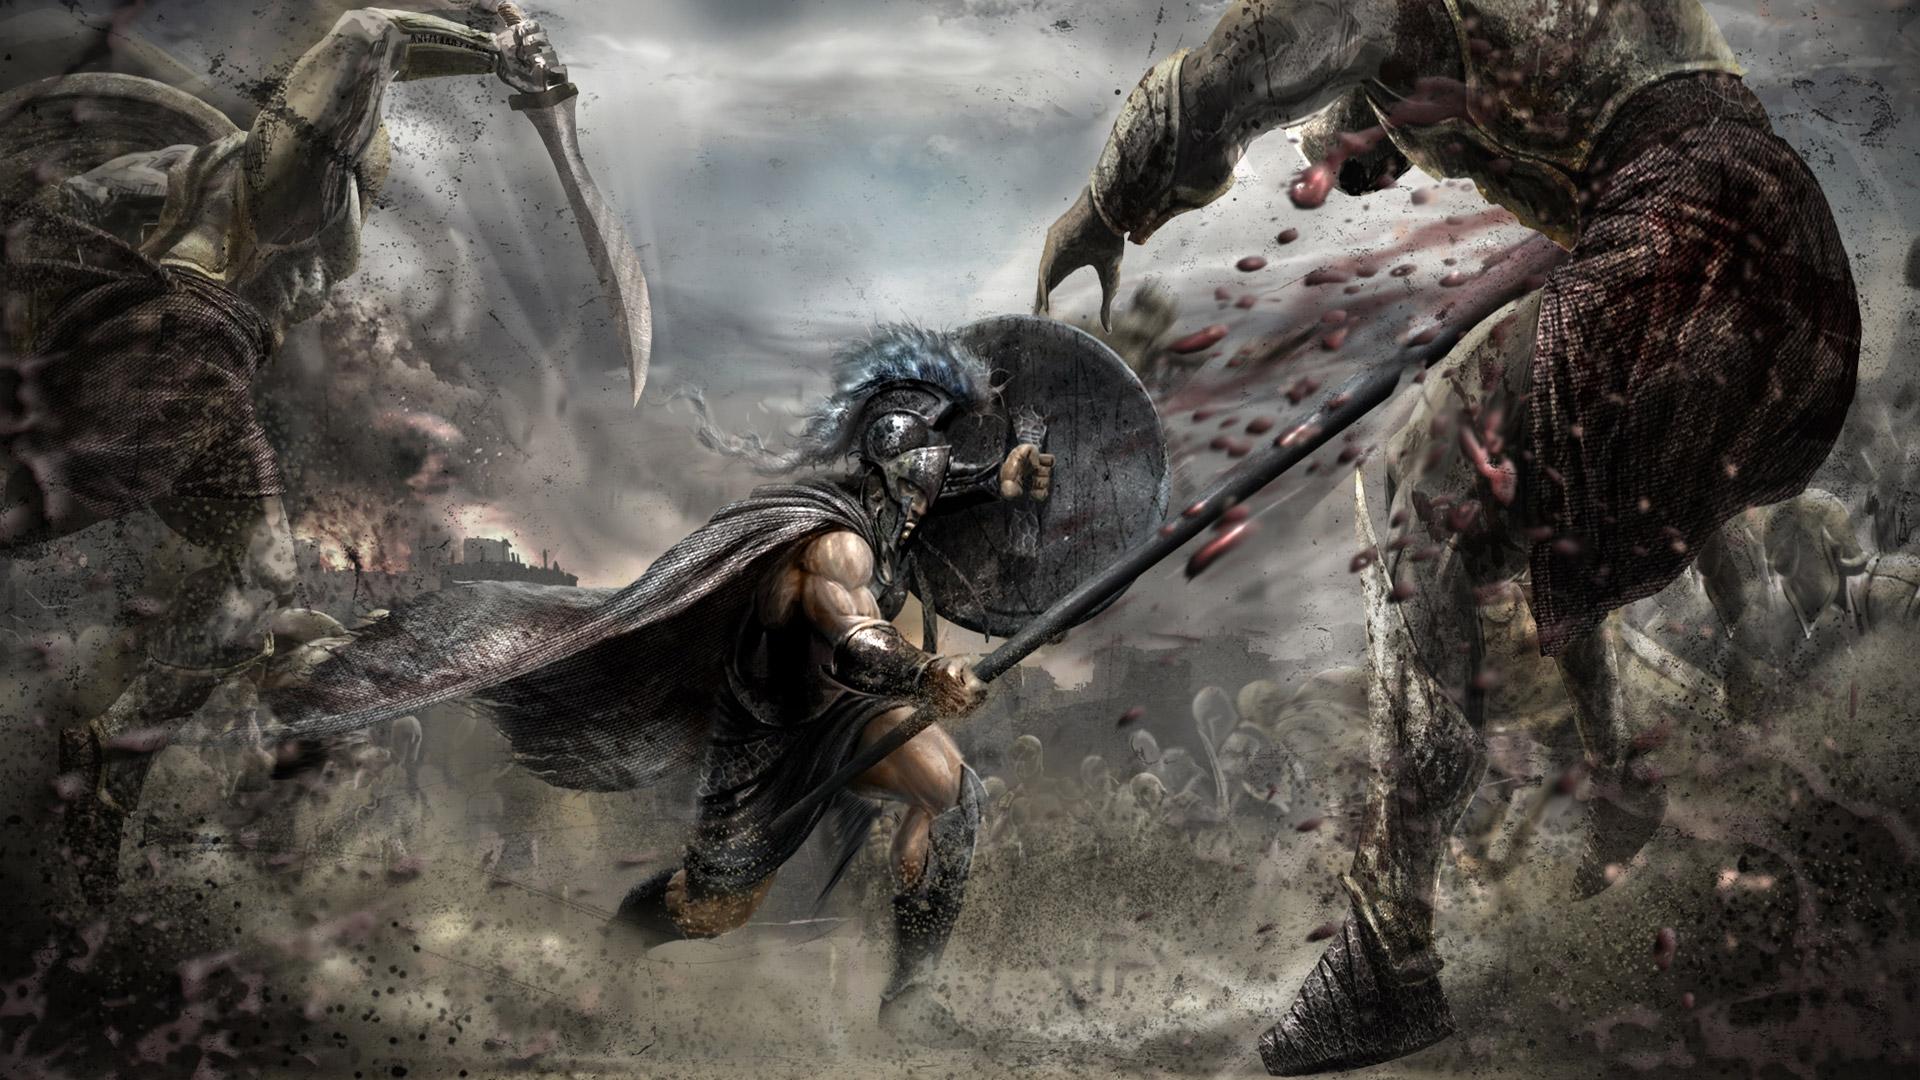 Warriors: Legends of Troy Wallpaper in 1920x1080